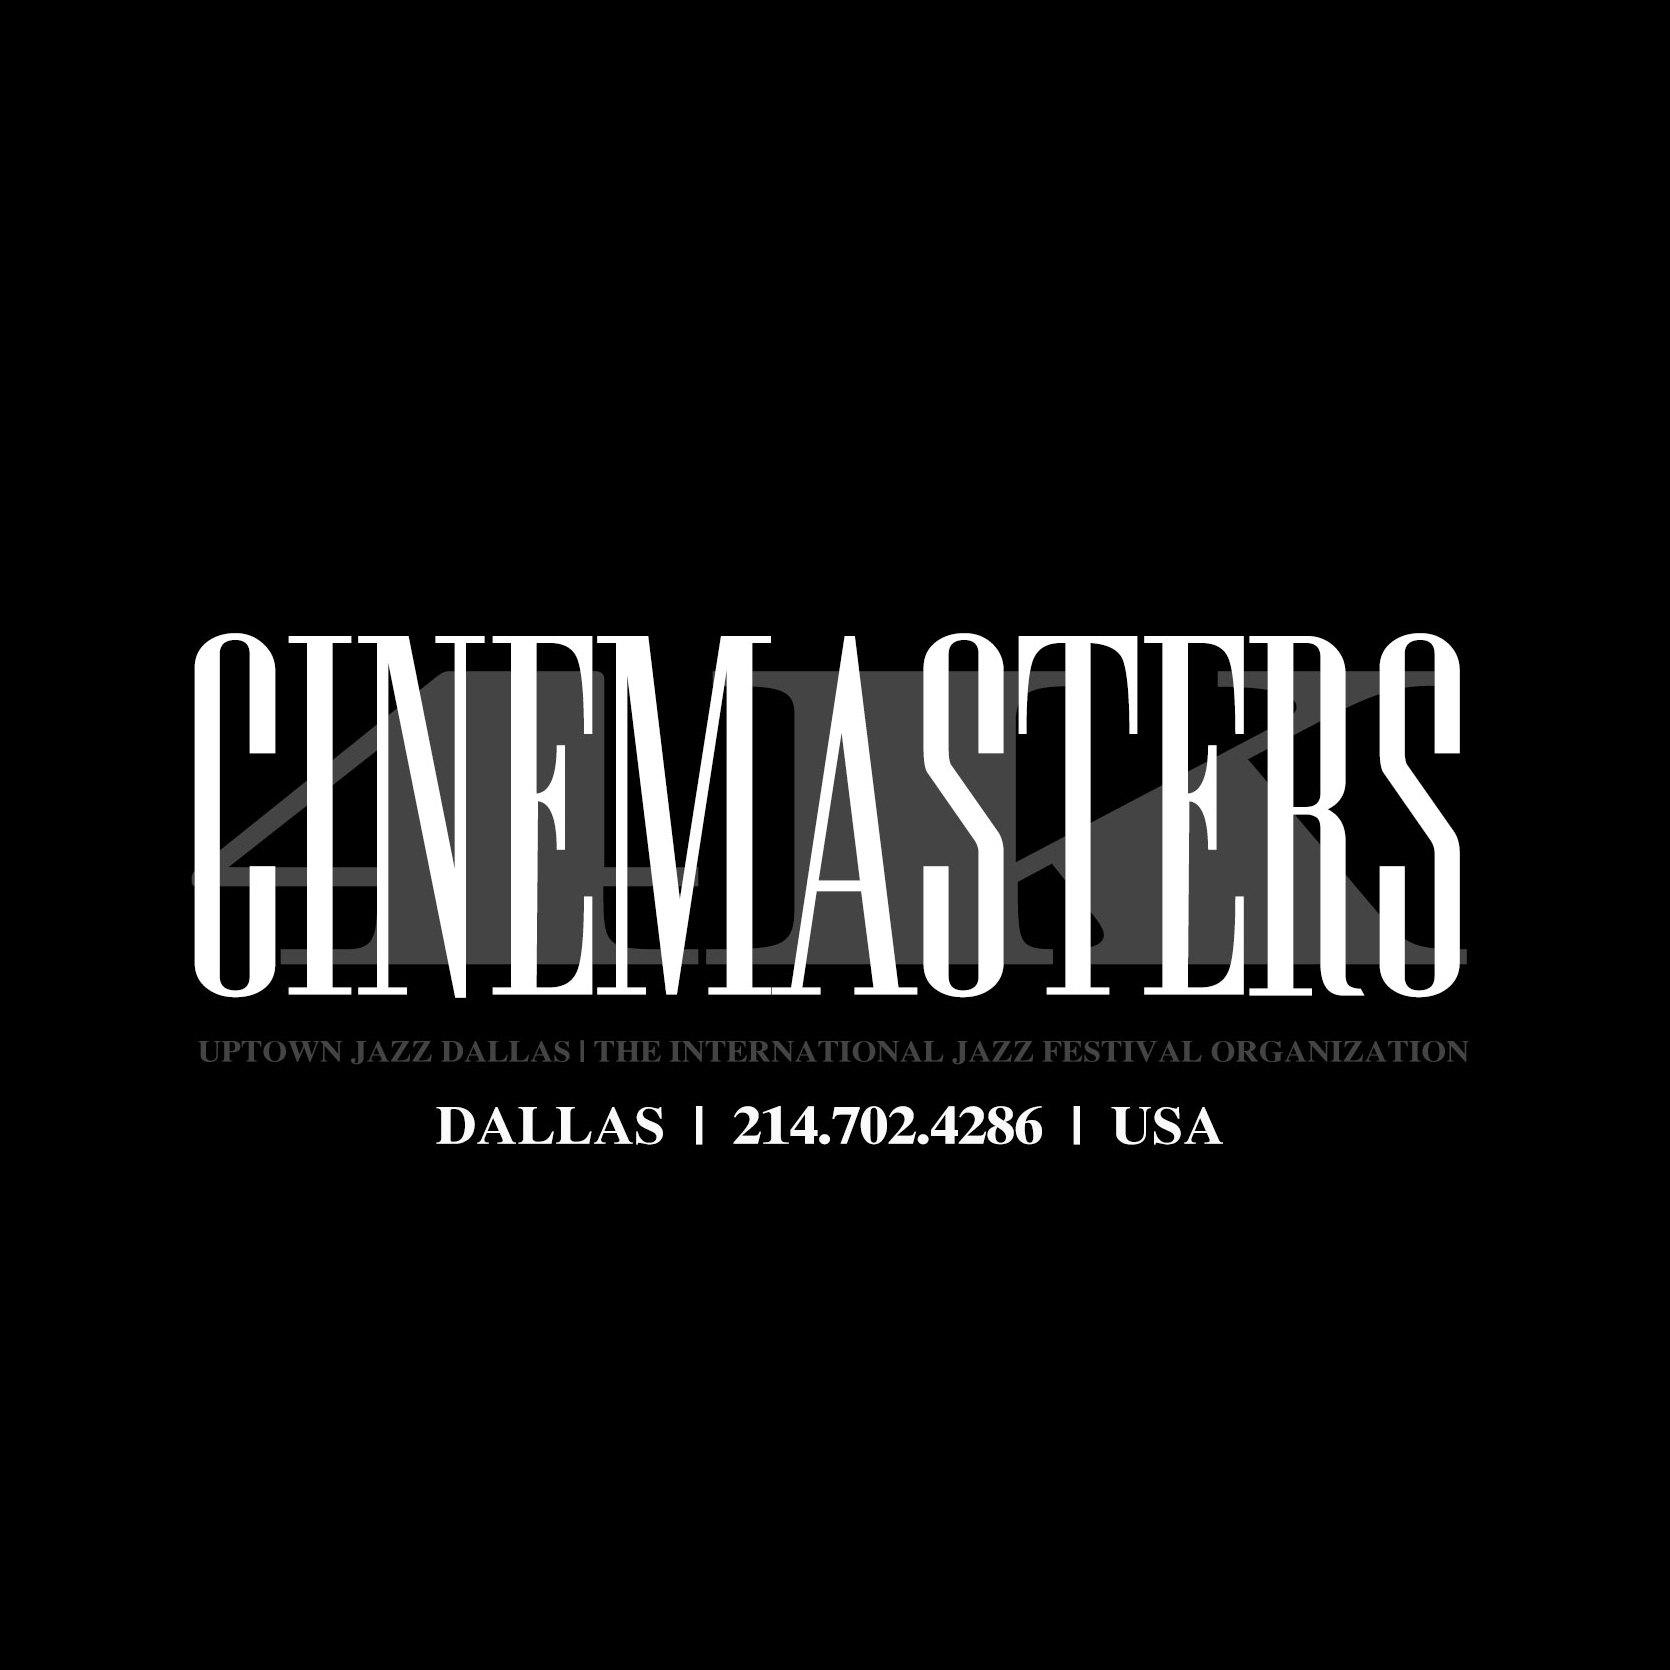 CINEMASTERS North America